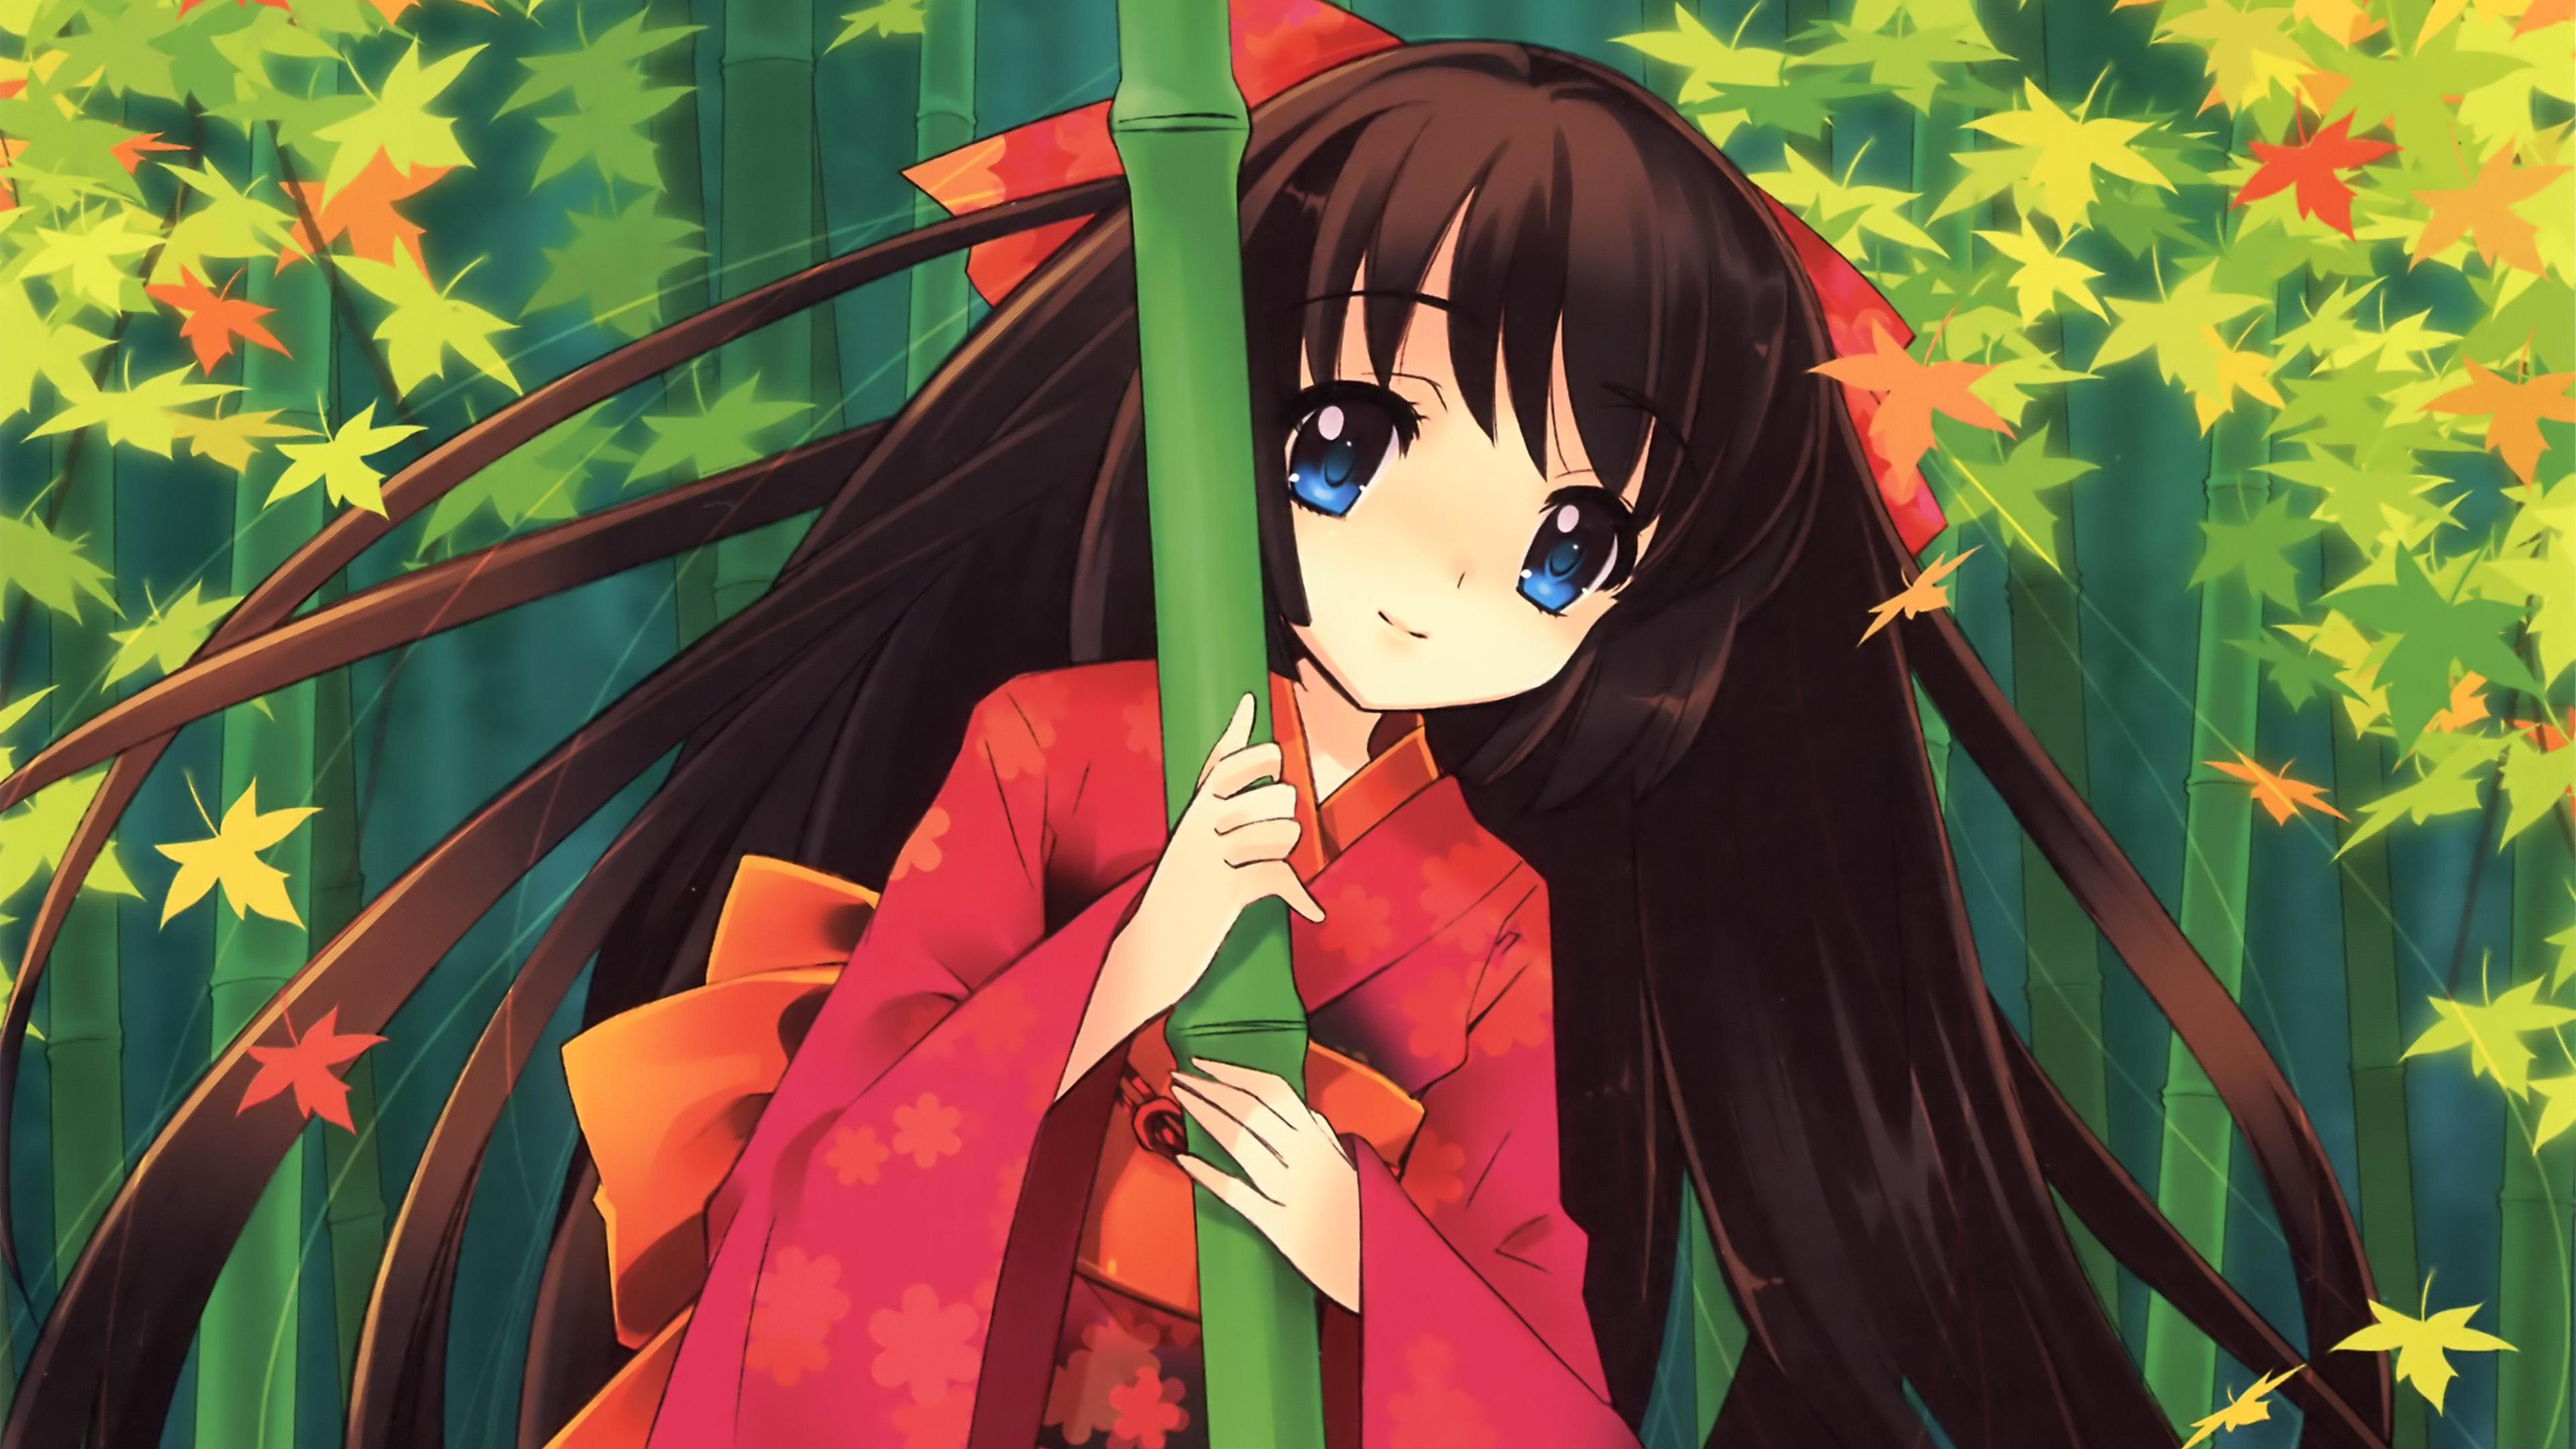 Aq46 Anime Girl Japan Art Cute Wallpaper